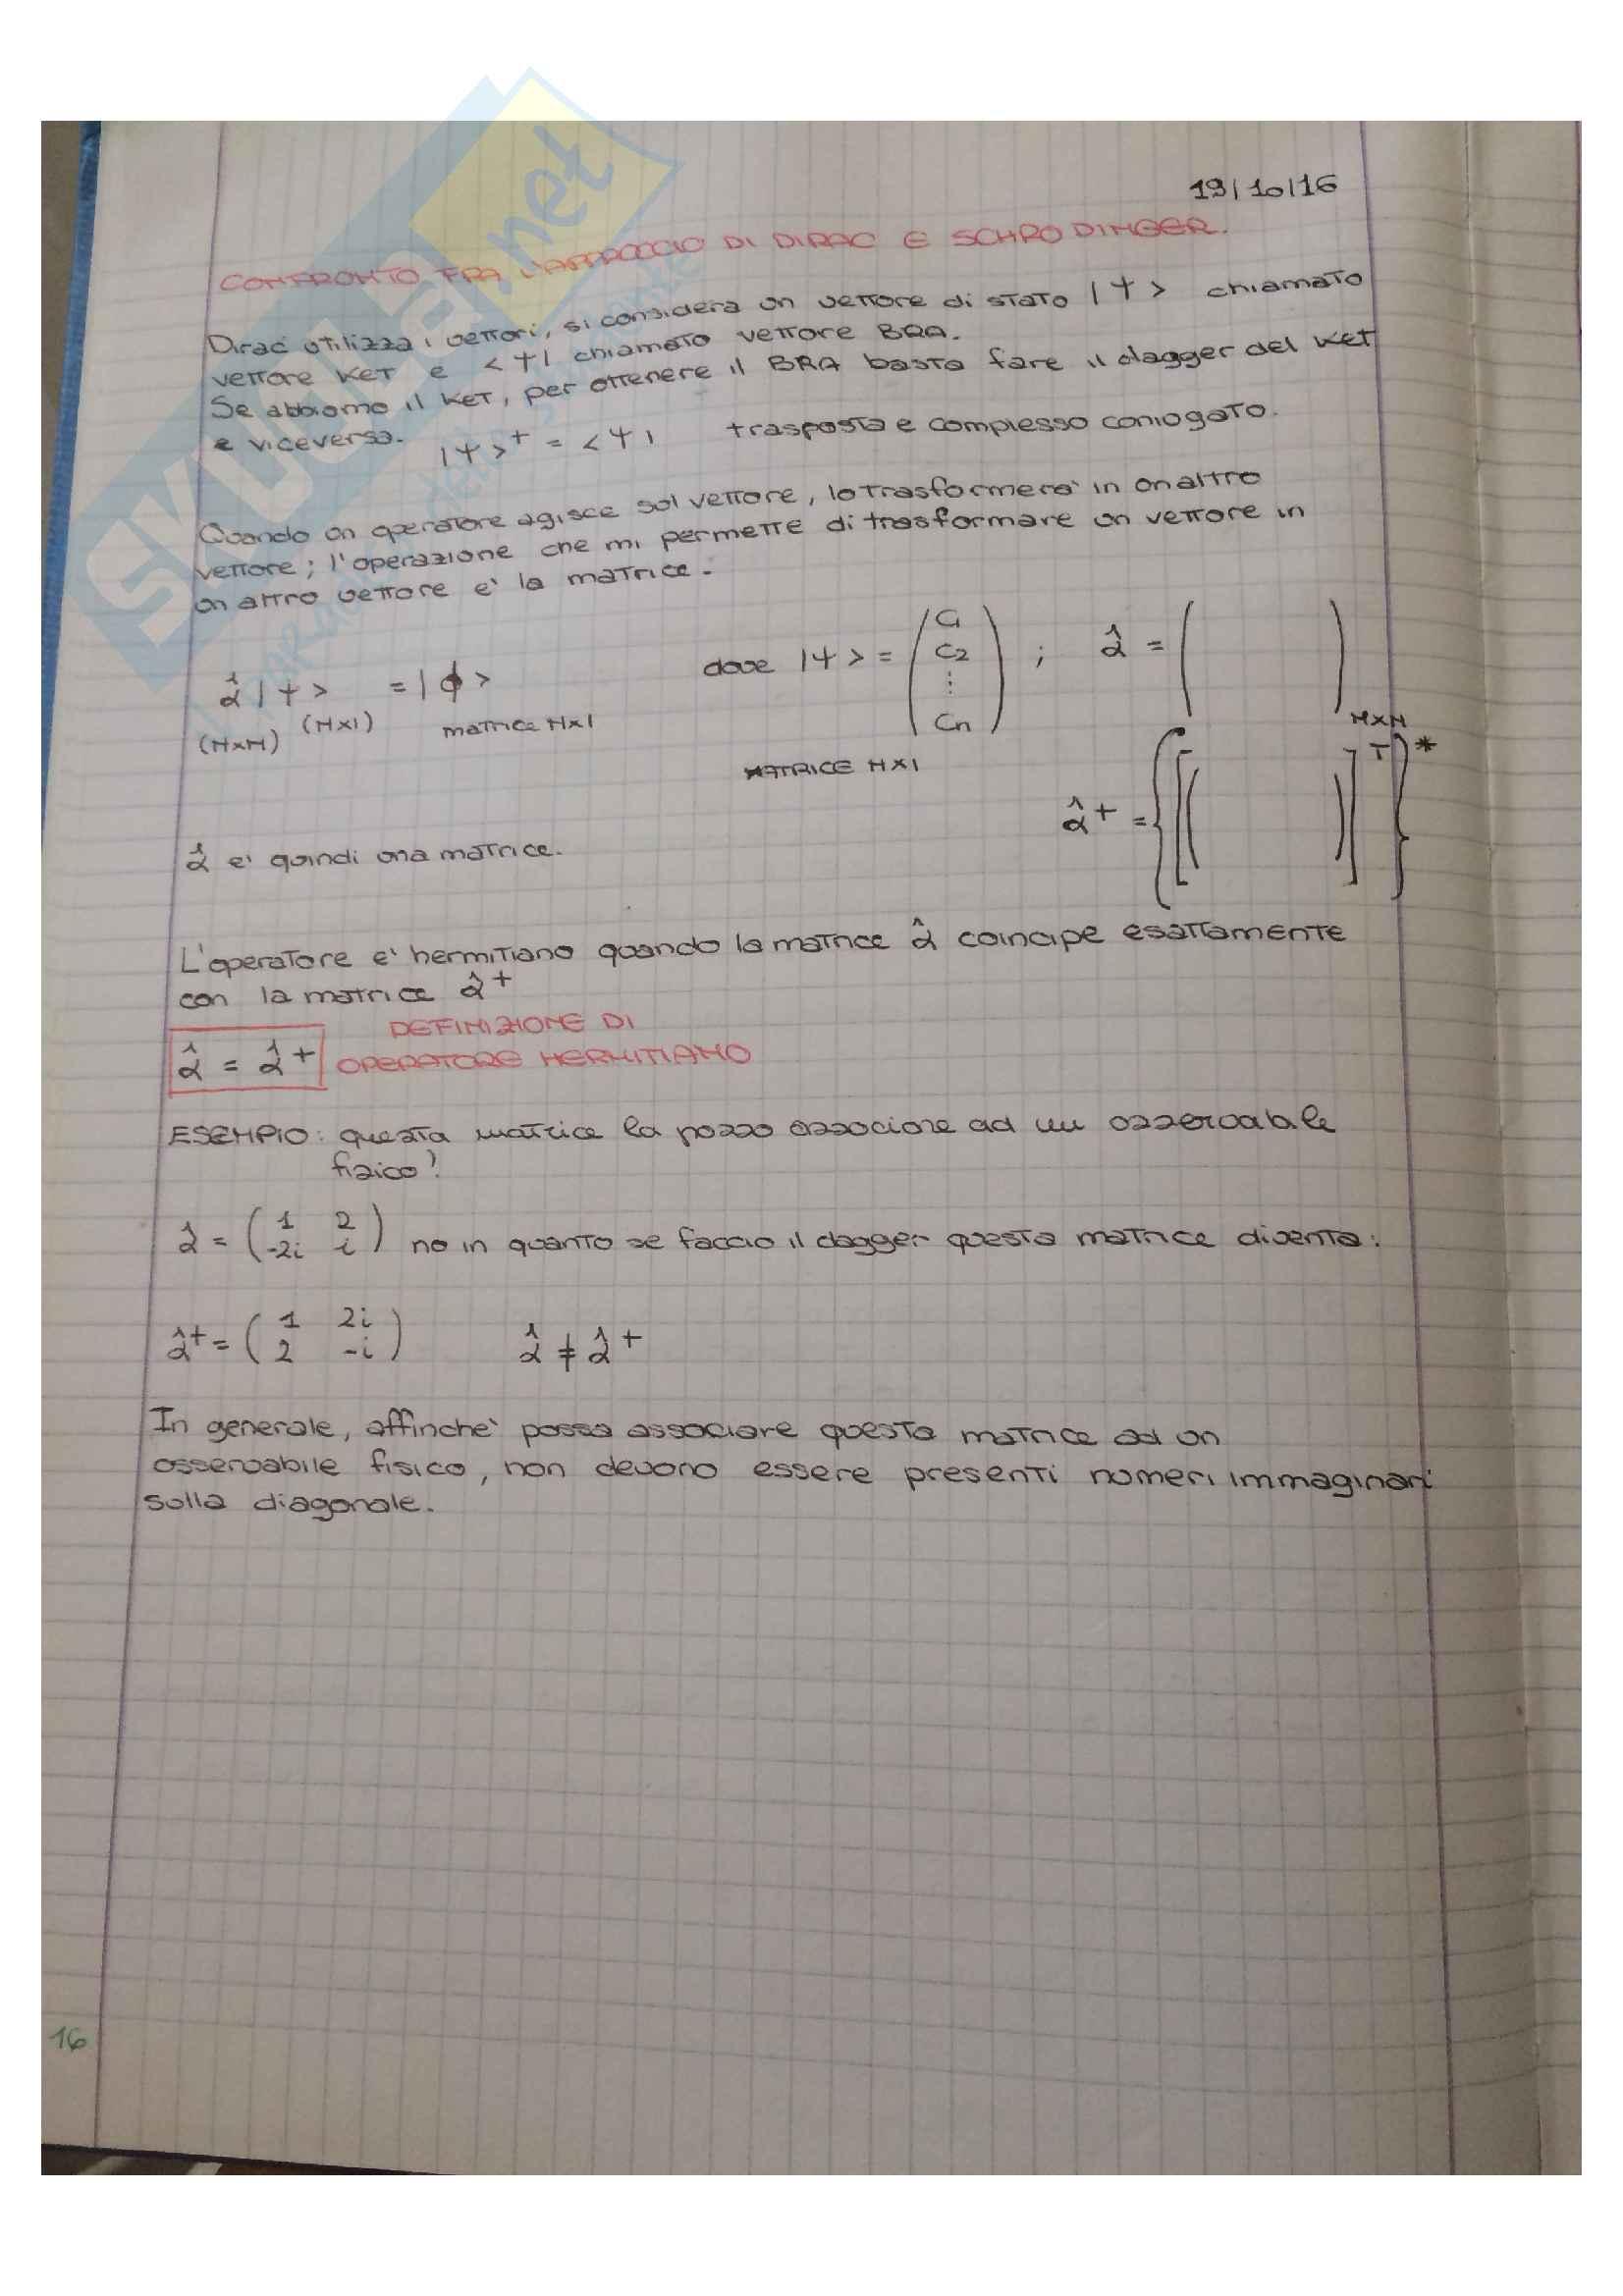 Appunti di Meccanica quantistica Pag. 16